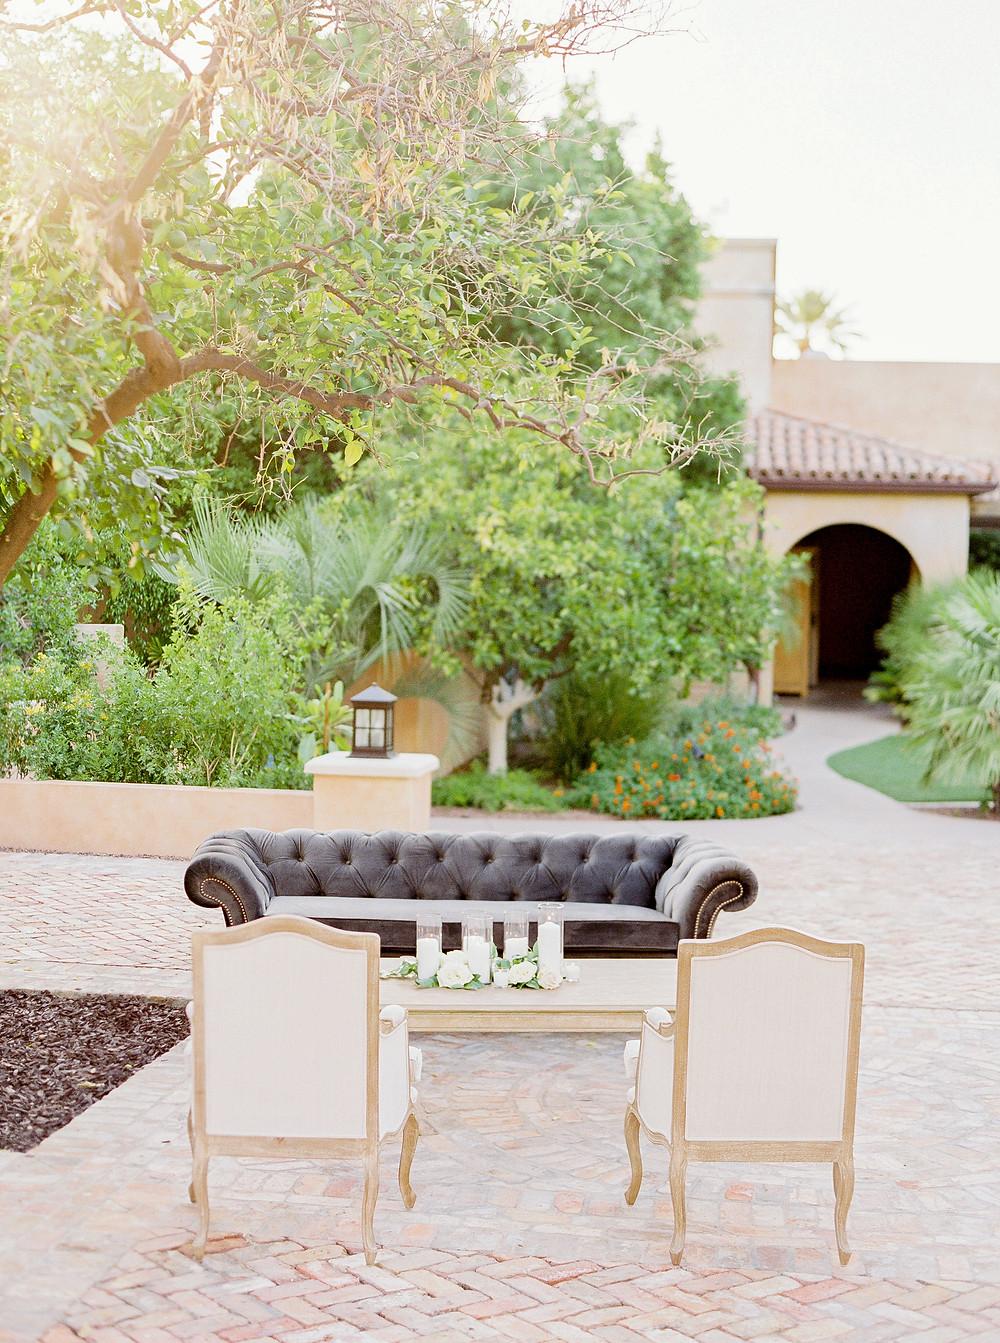 Royal Palms Wedding, Reception Details, Lounge Furniture